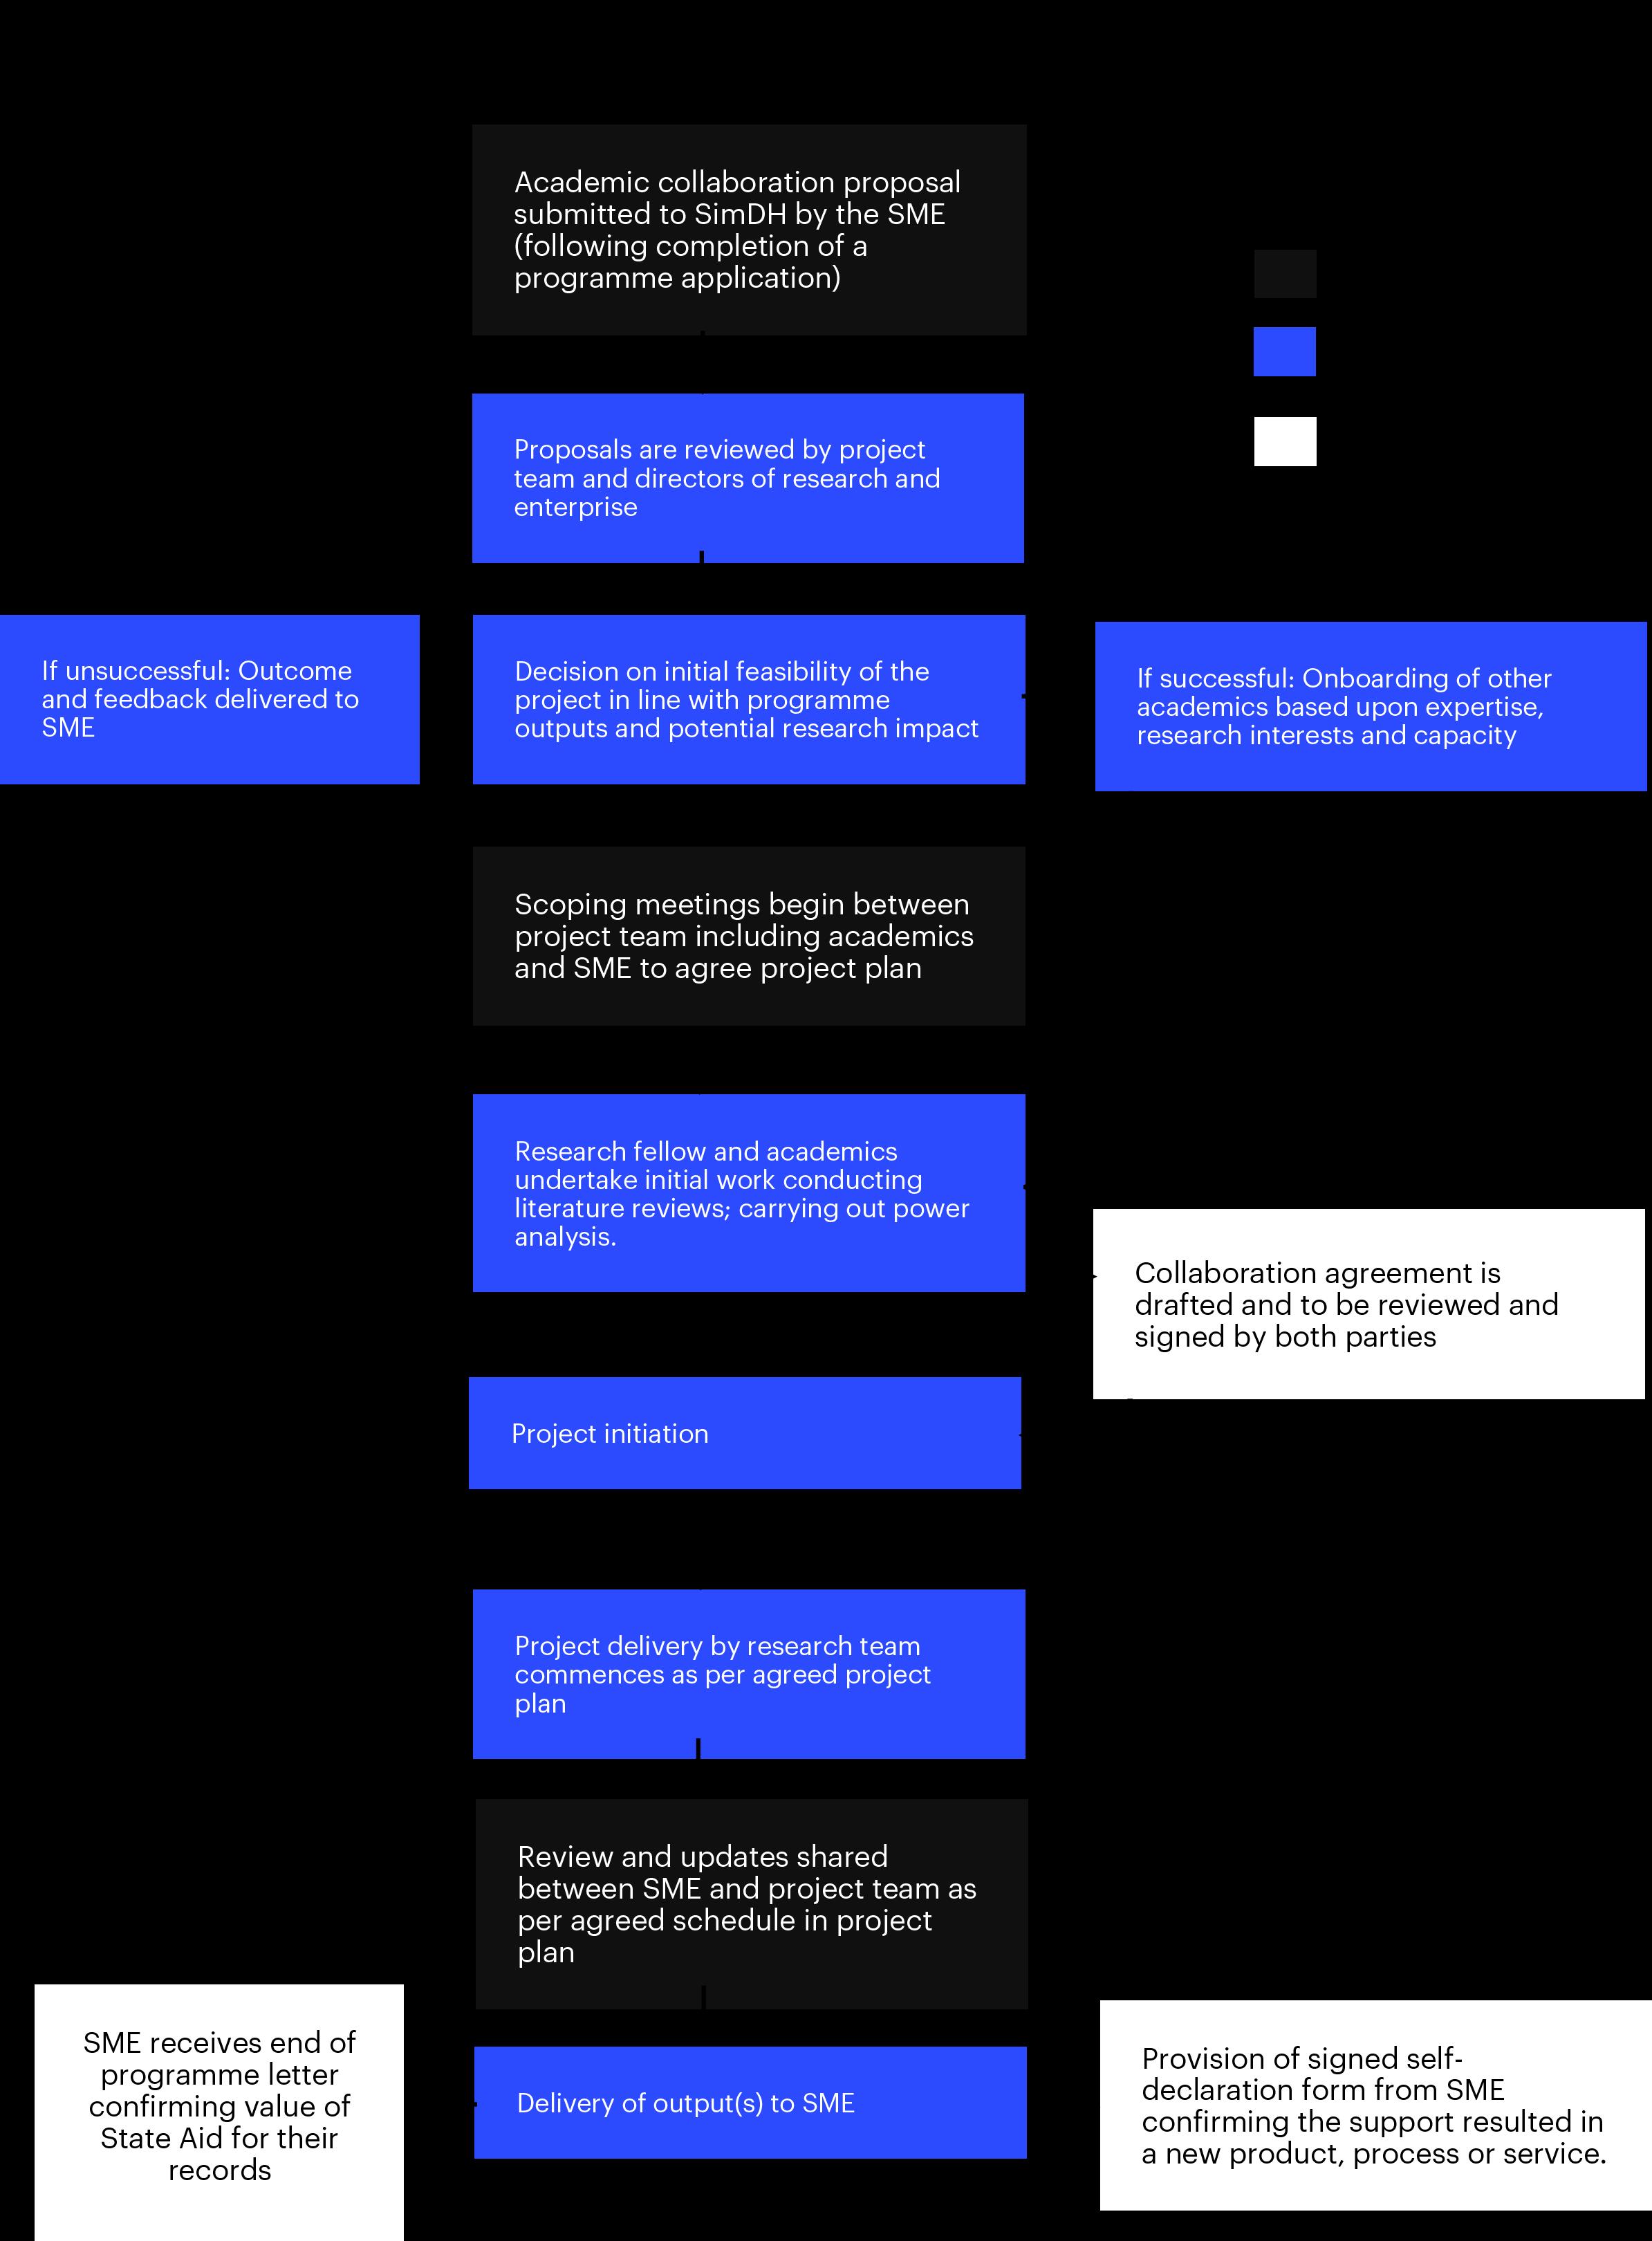 Flowchart of academic collaboration